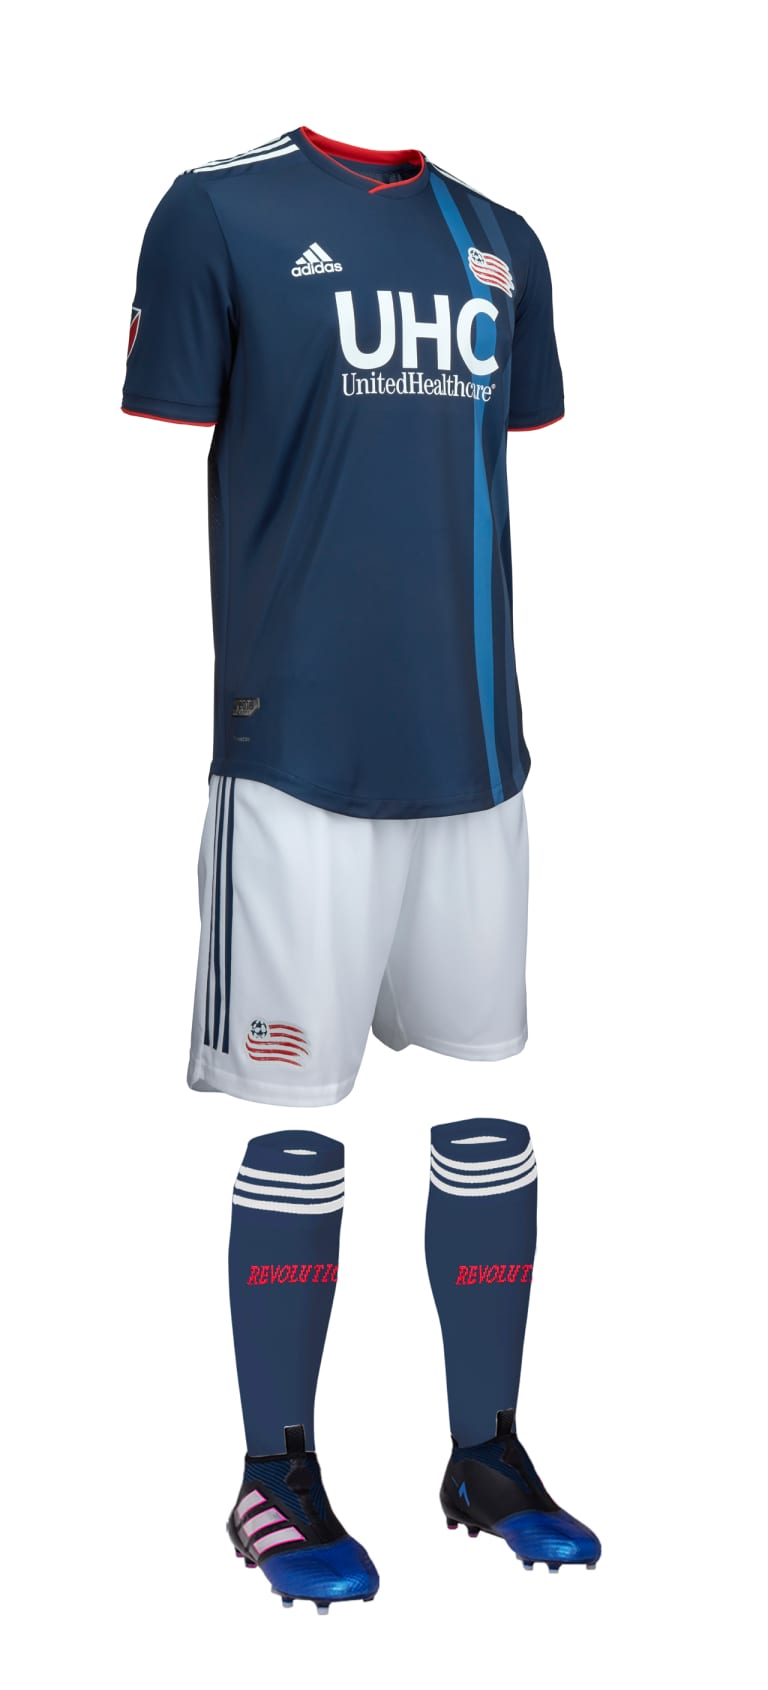 New England Revolution reveal new primary jersey for 2018 - https://league-mp7static.mlsdigital.net/images/Adidas_MLS_2018_GhostBody_NERevolution_Primary-web.jpg